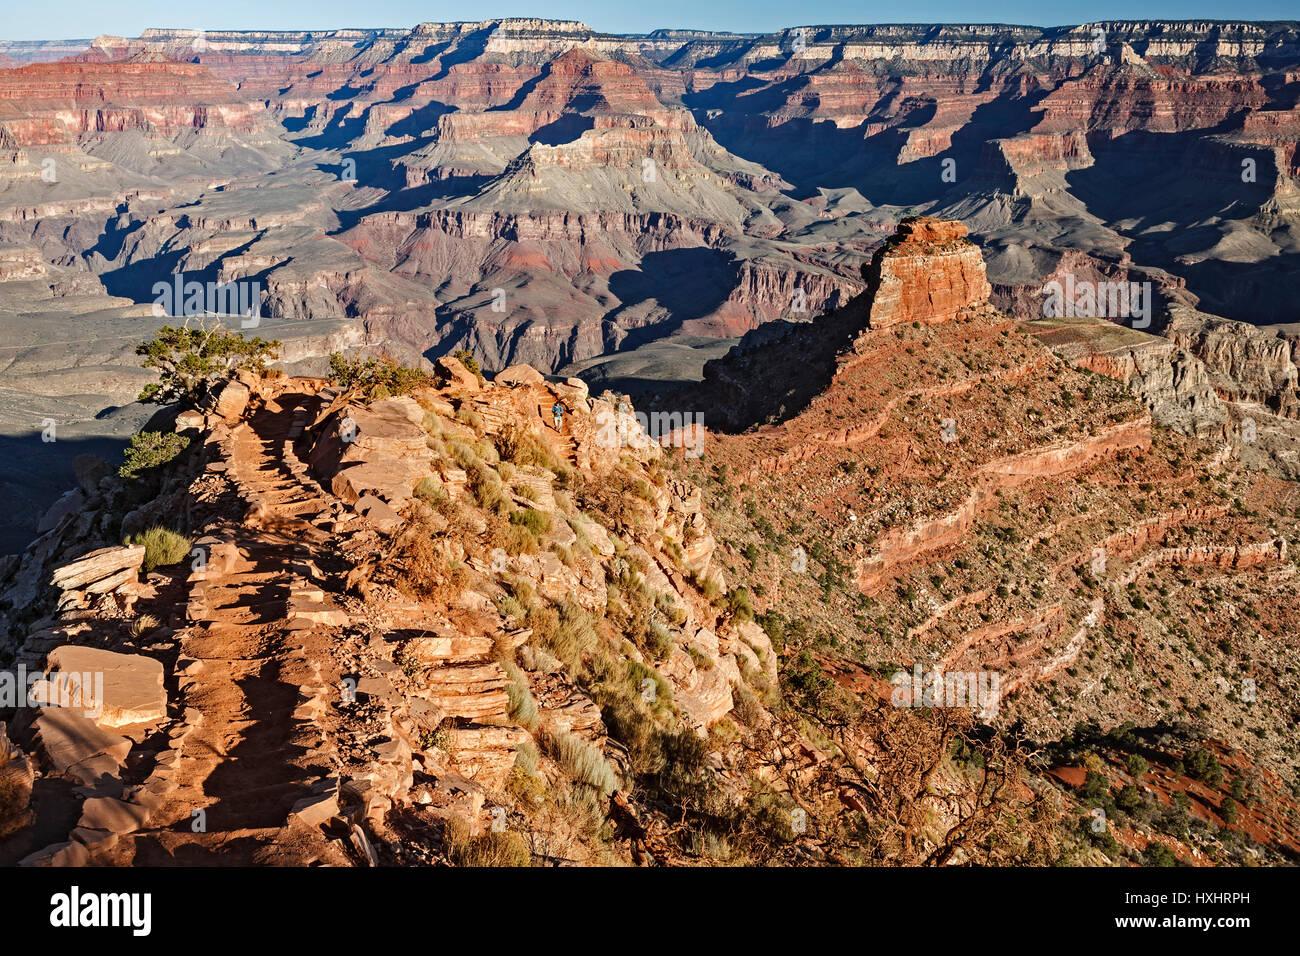 Hiker descending South Kaibab Trail, Grand Canyon National Park, Arizona USA - Stock Image